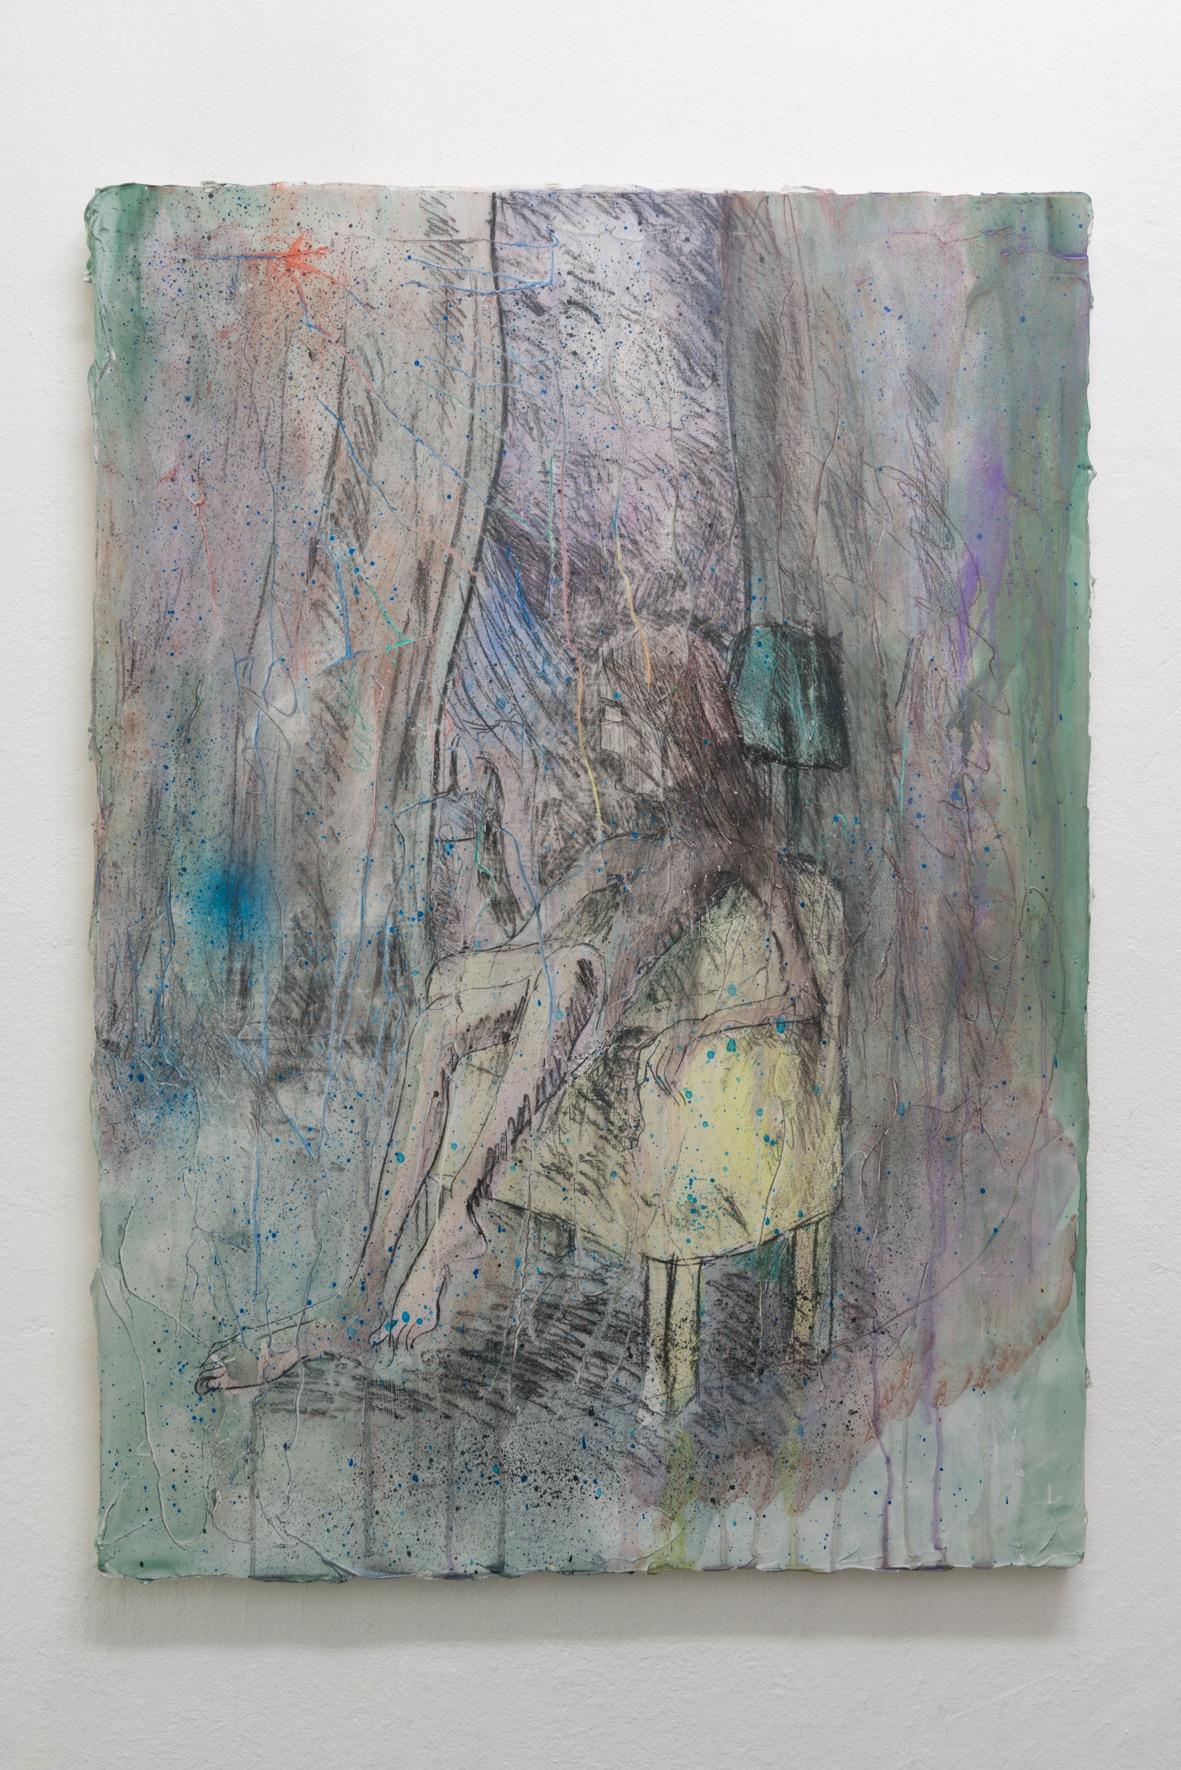 Emi Mizukami, The bottom of the night, Acrylic and graphite on canvas, 91 x 65 cm, 2020